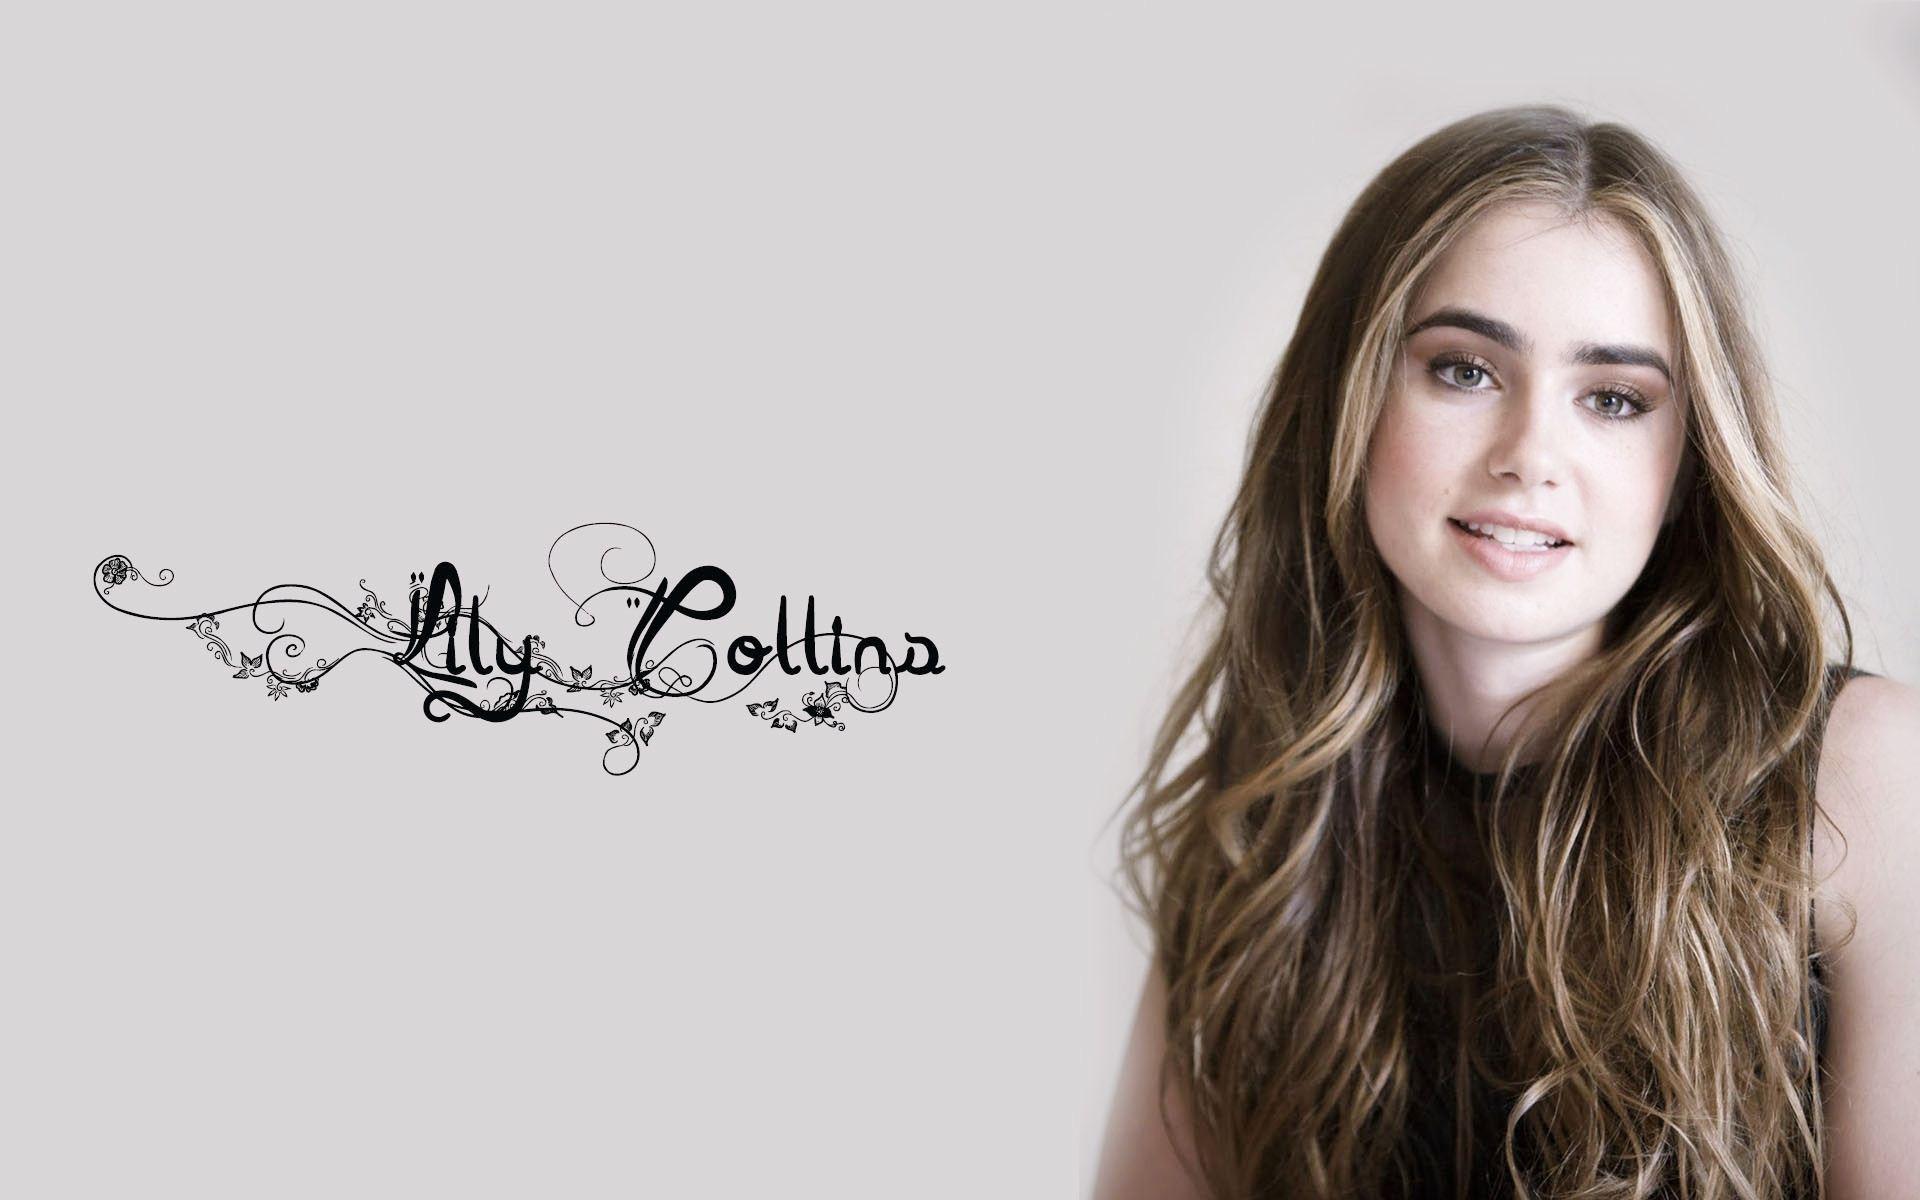 lily collins 2014 desktop wallpaper 1920x1200